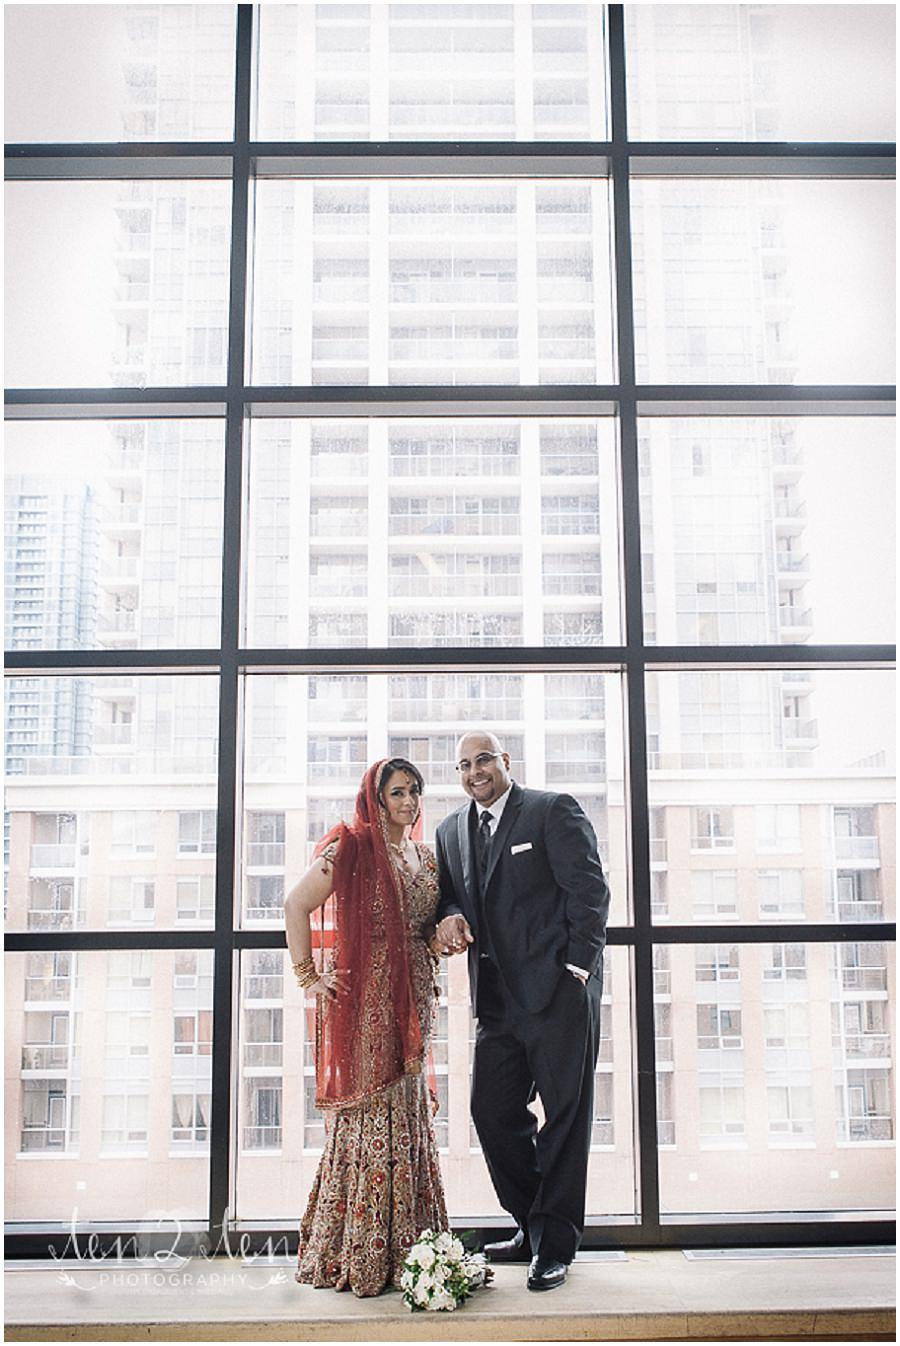 Mississauga city hall photographer mississauga civic center photography indoor wedding photography toronto indoor